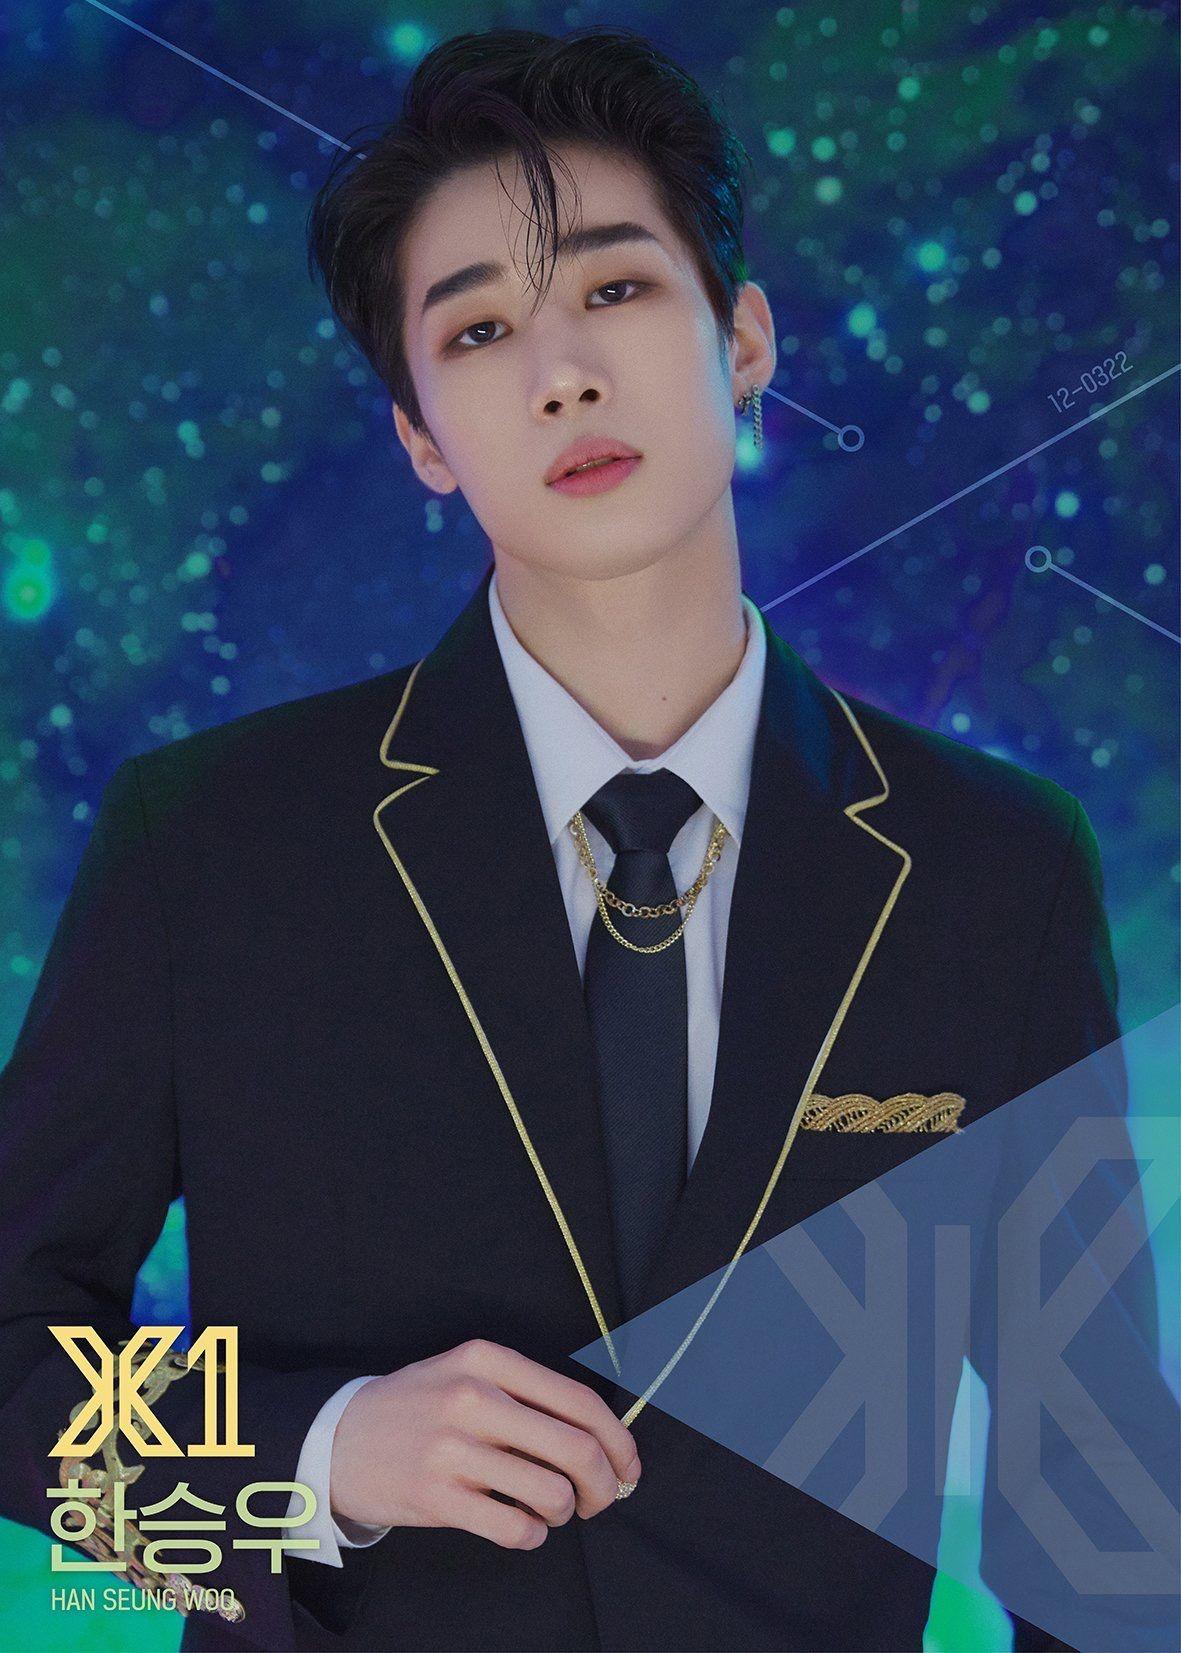 Seungwoo Han 94 Liner Victon Produce 101 Korean Idol